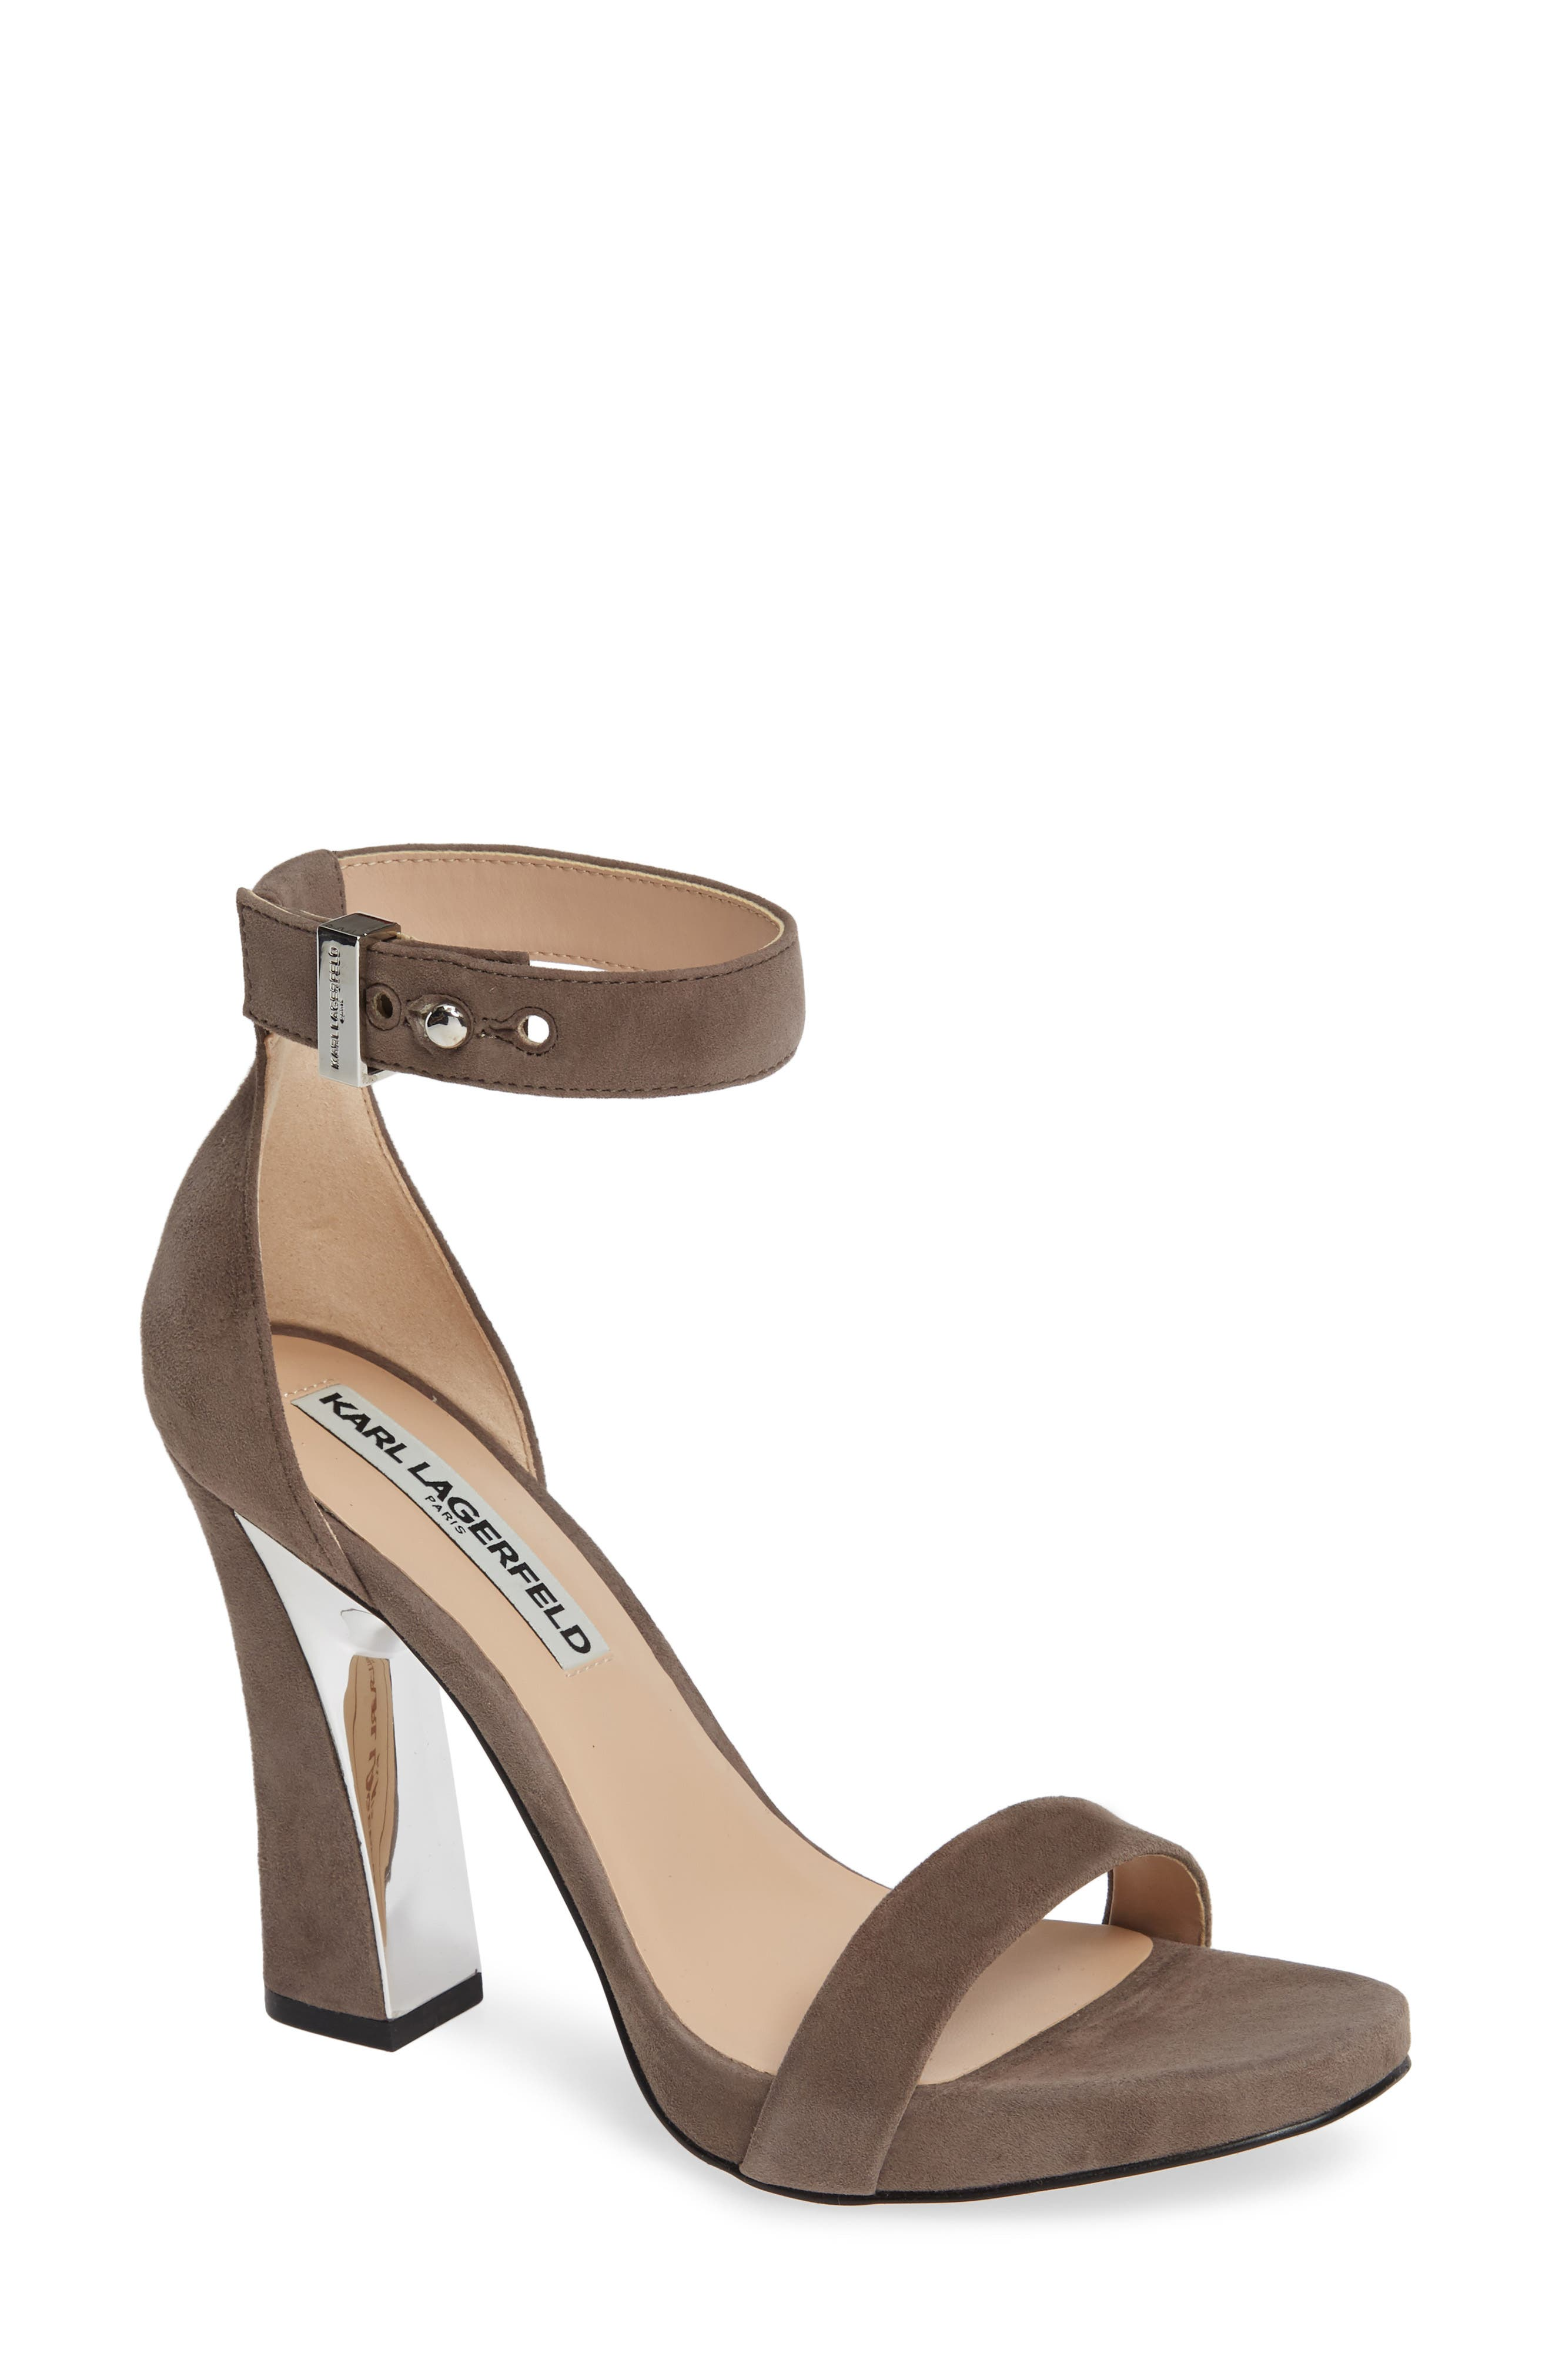 Karl Lagerfeld Paris Carah Ankle Strap Sandal- Grey